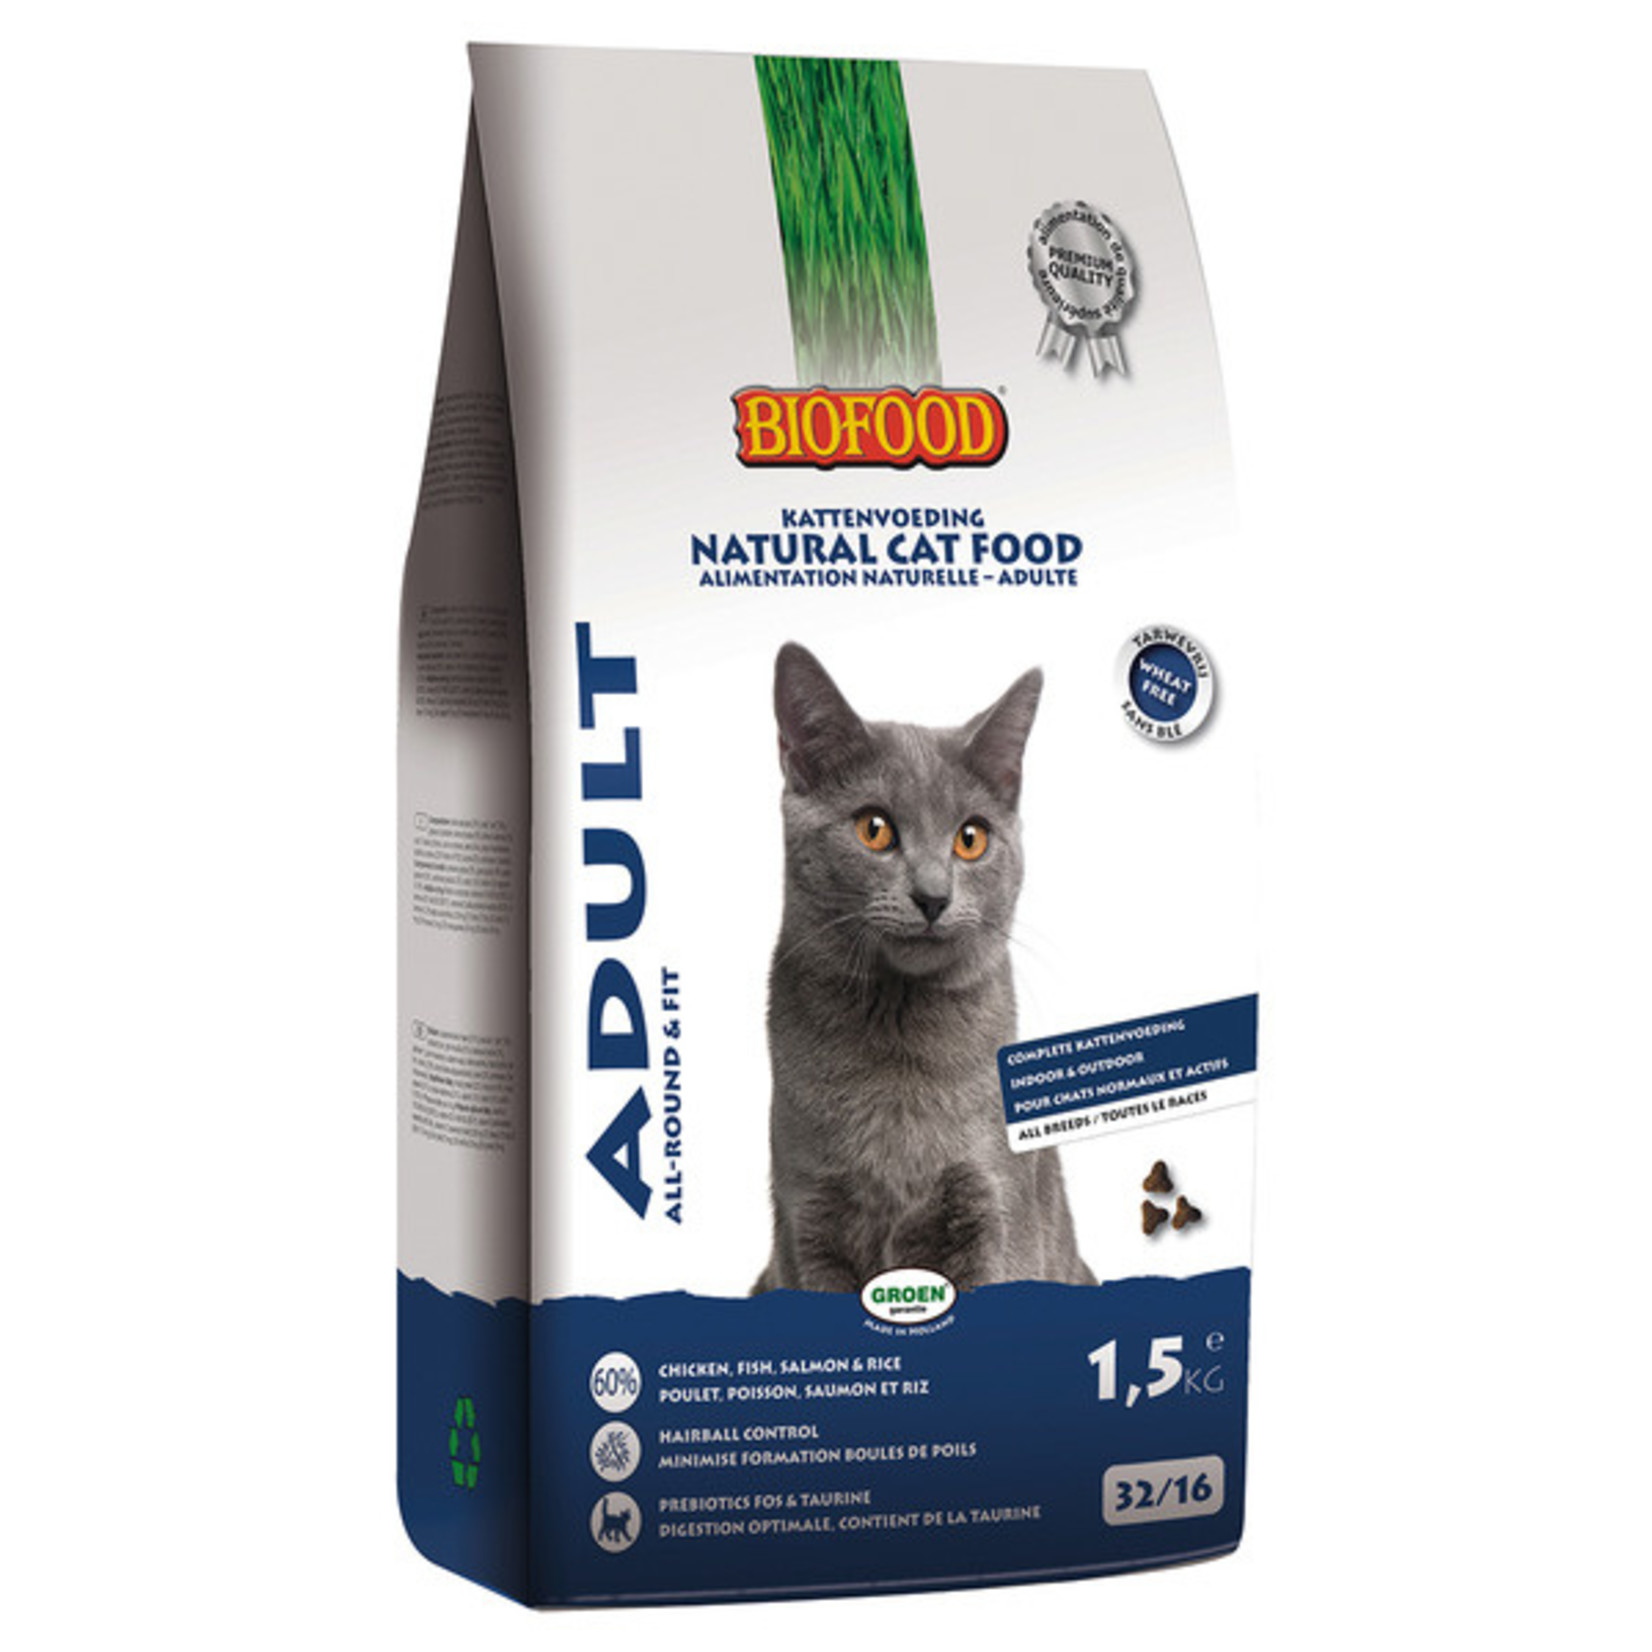 Biofood Cat Adult 1,5 kg